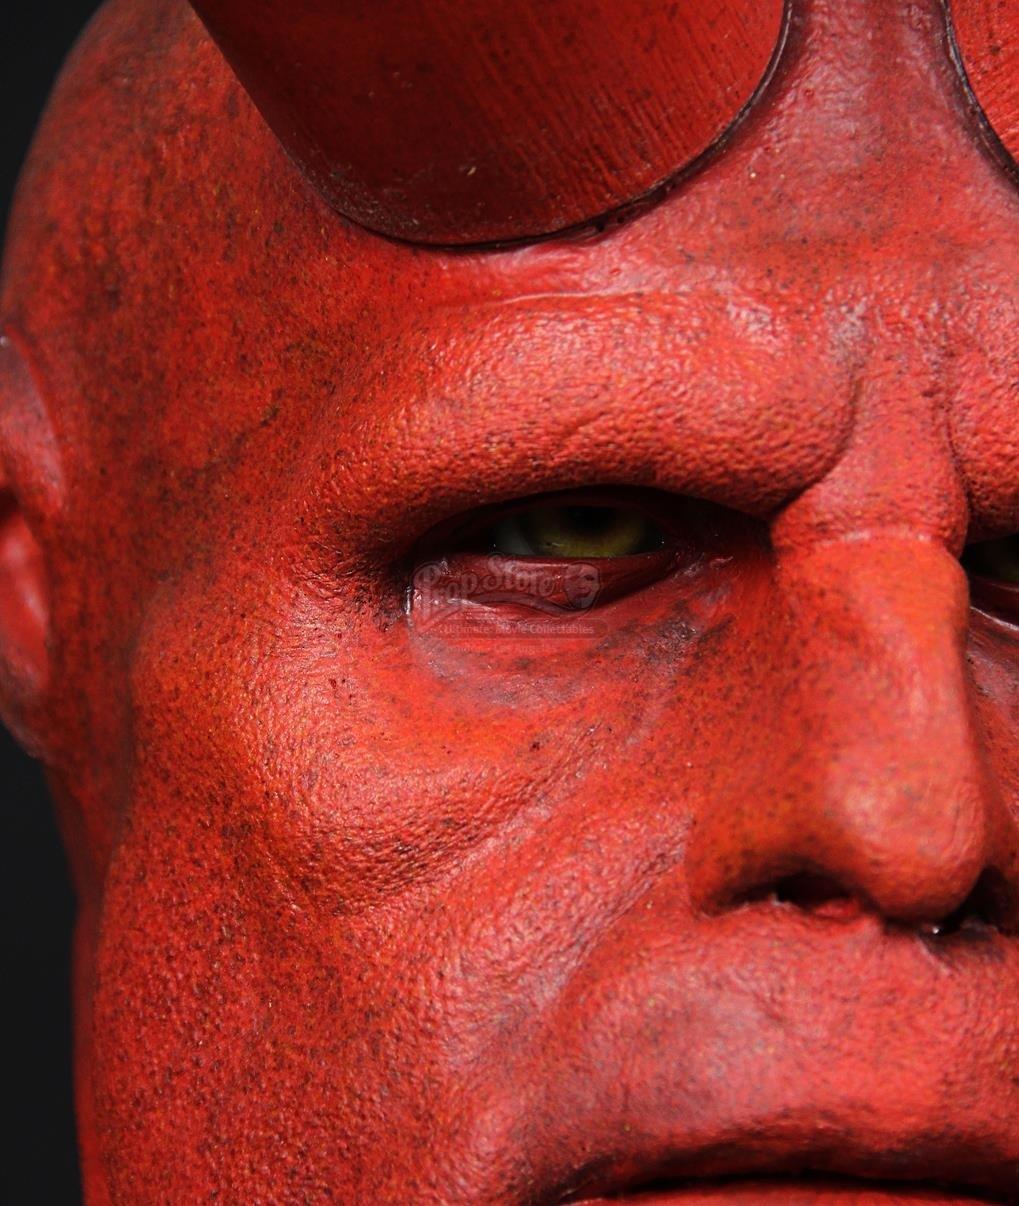 Hellboy 2004 Hellboy Ron Perlman Facial Appliance